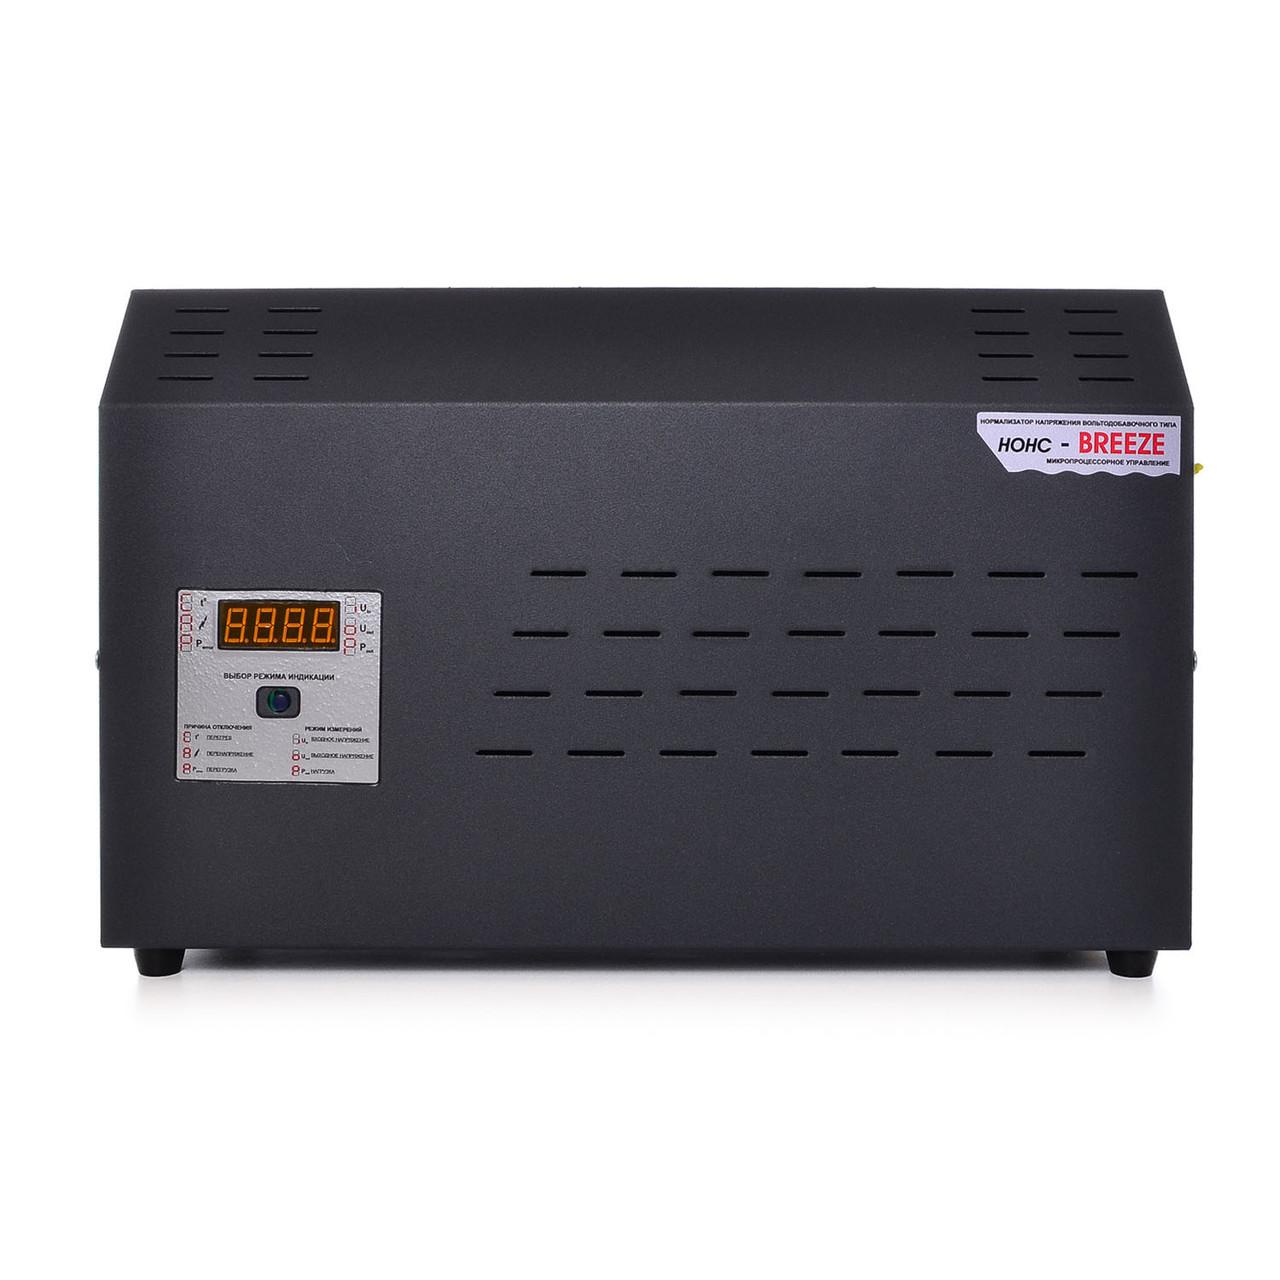 Стабилизатор NONS-9,0 кВт BREEZE 40А